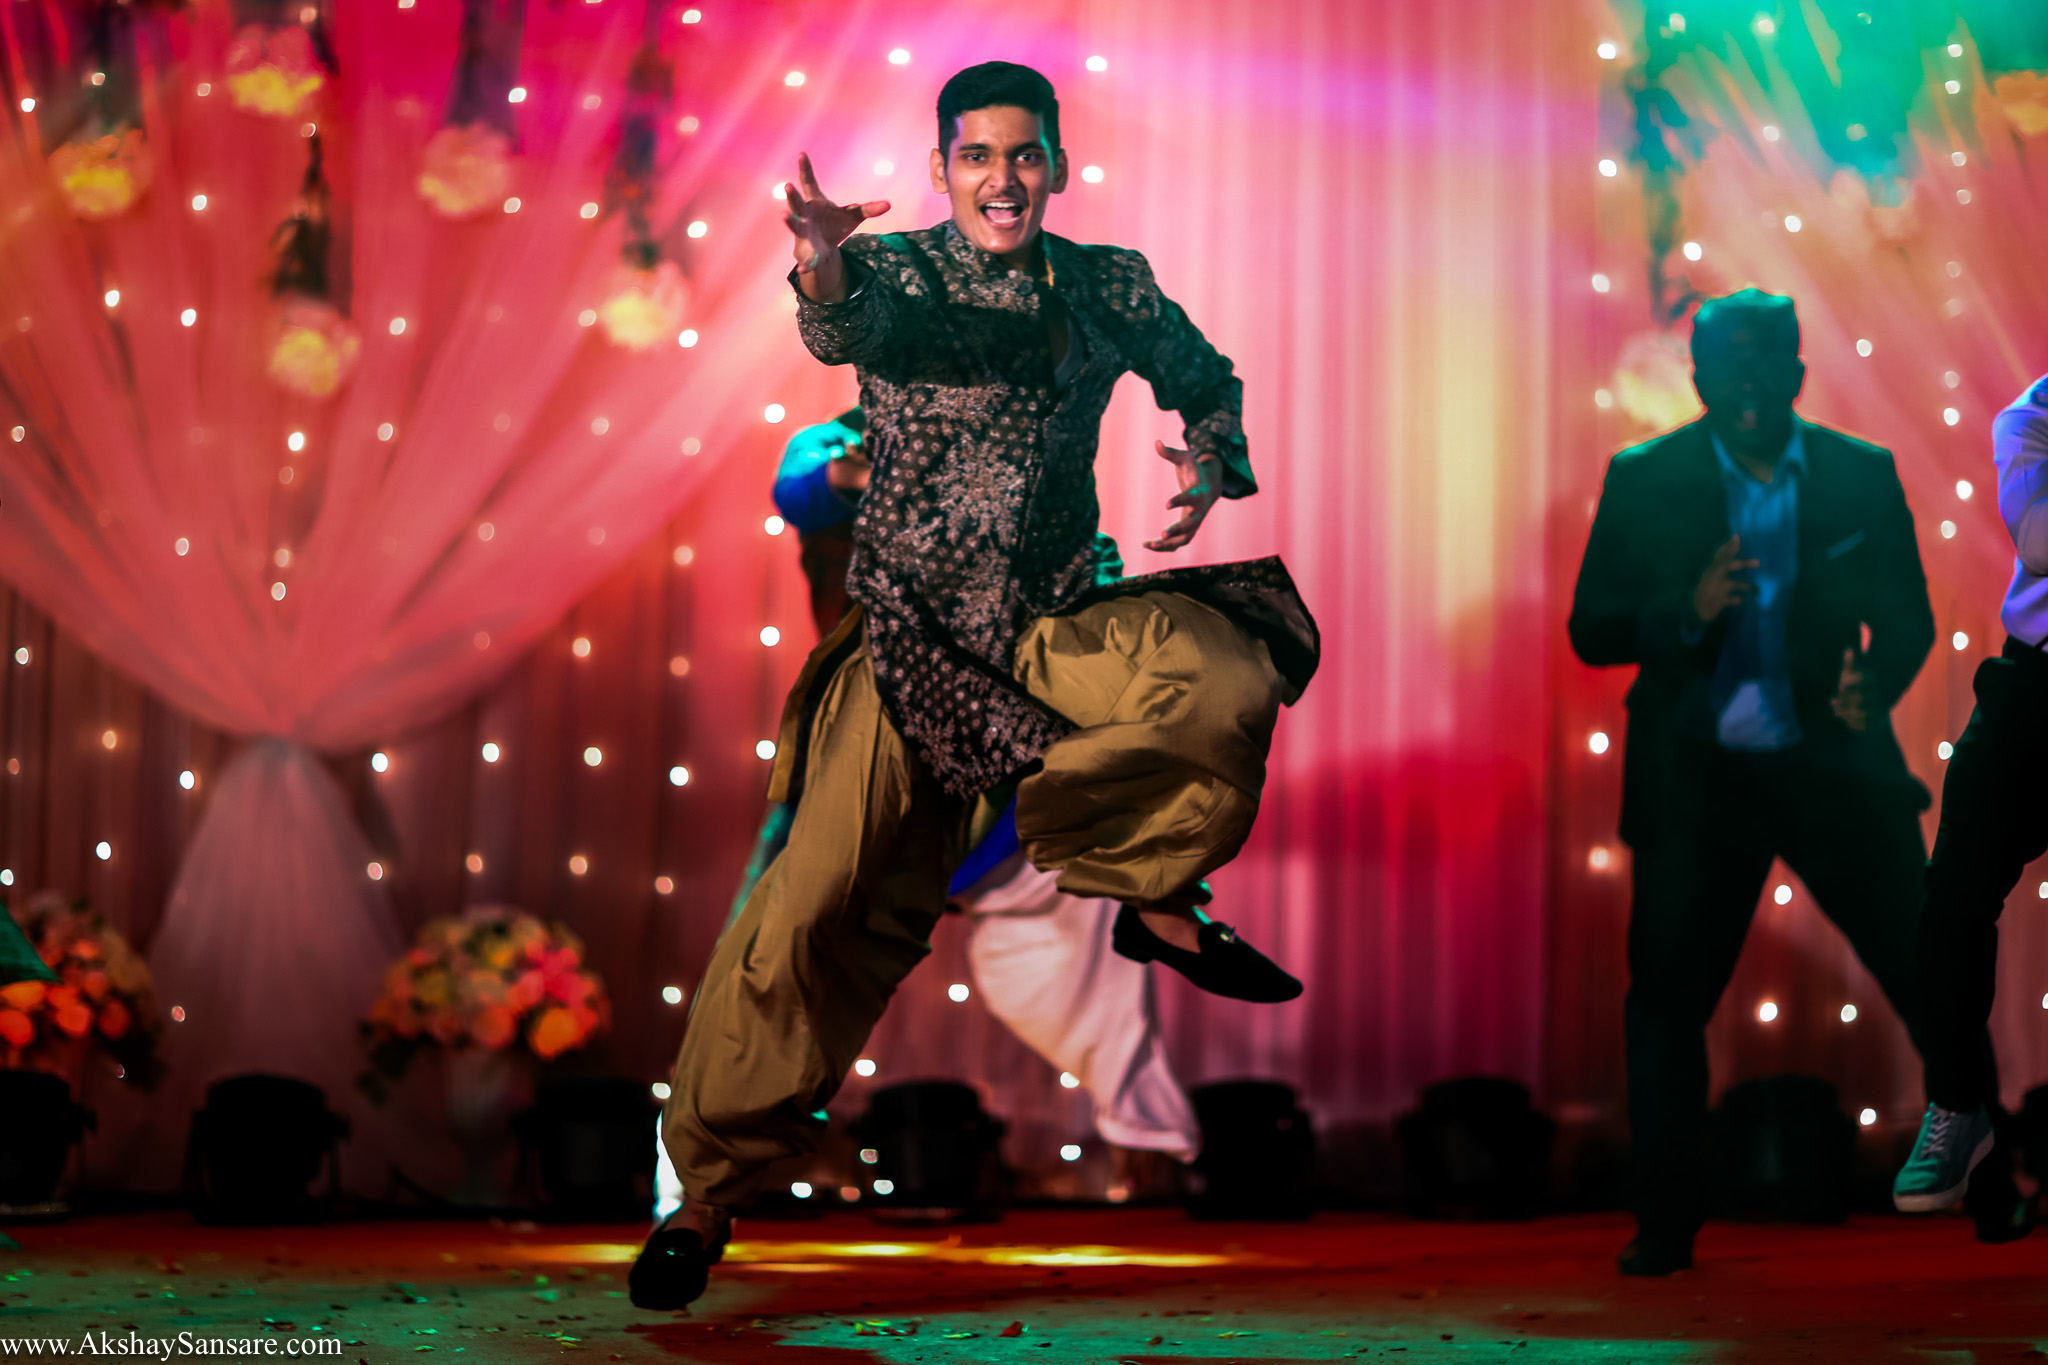 Akshay Sansare Photography Kunal x Shrutika best candid photographers in mumbai(16).jpg